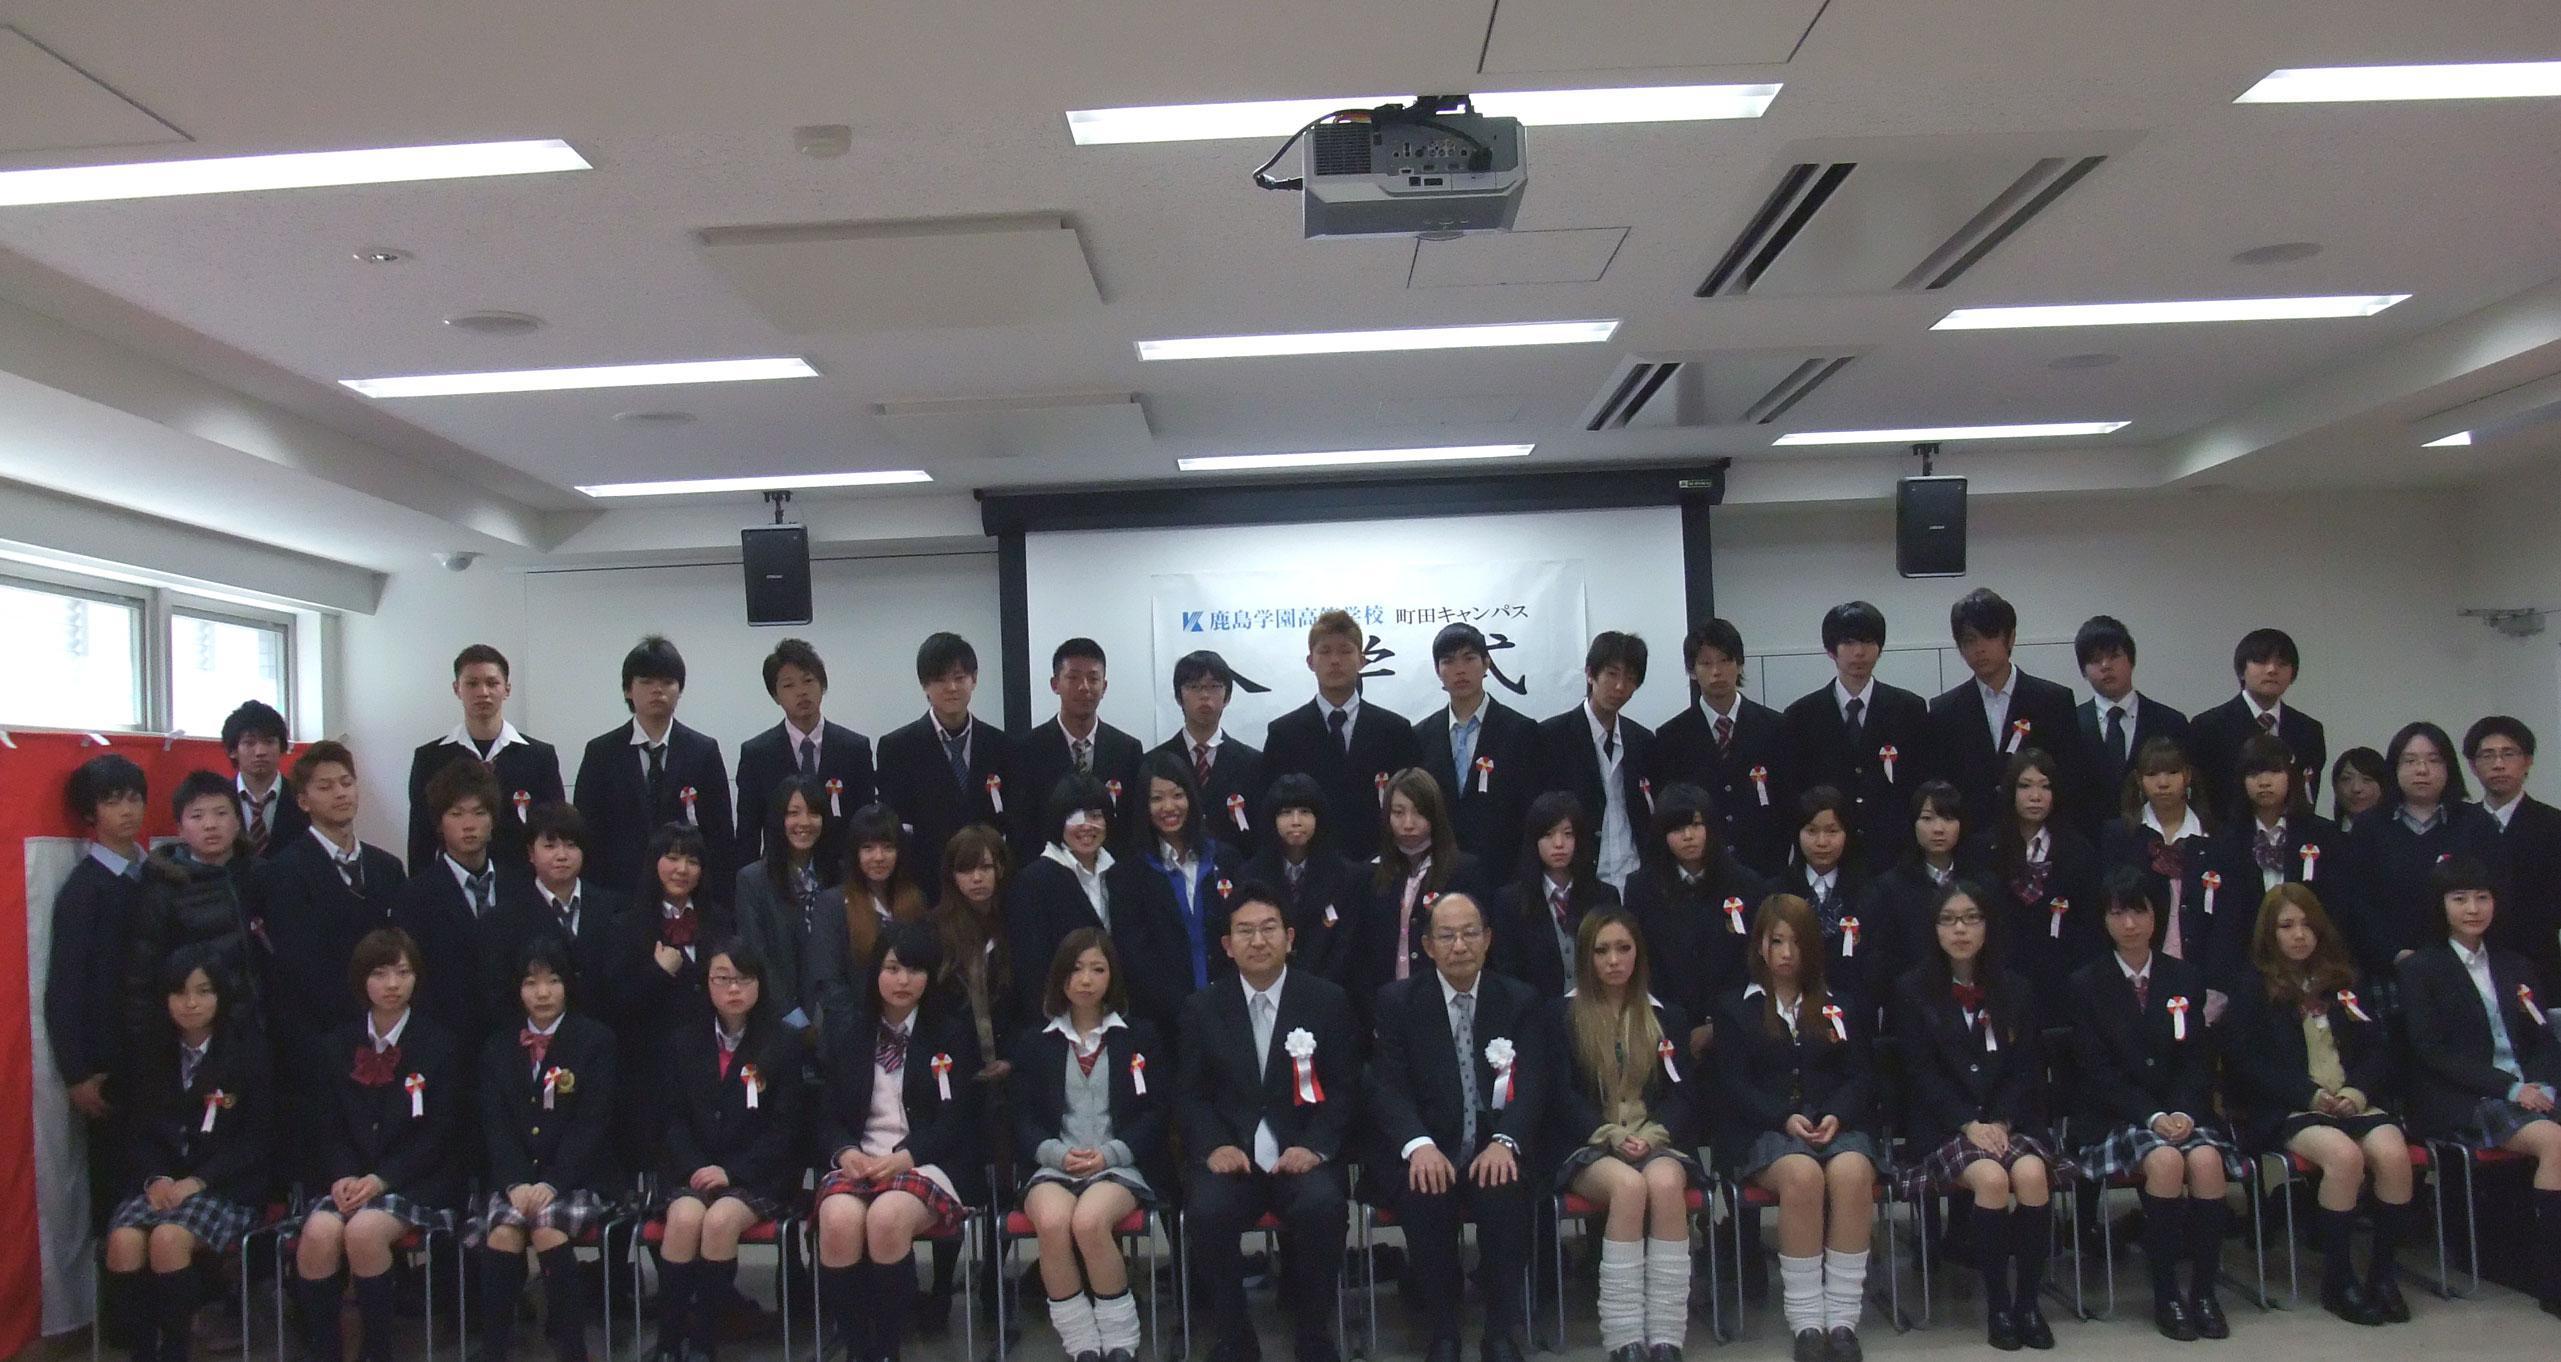 鹿島学園高等学校通信課程 町田キャンパス